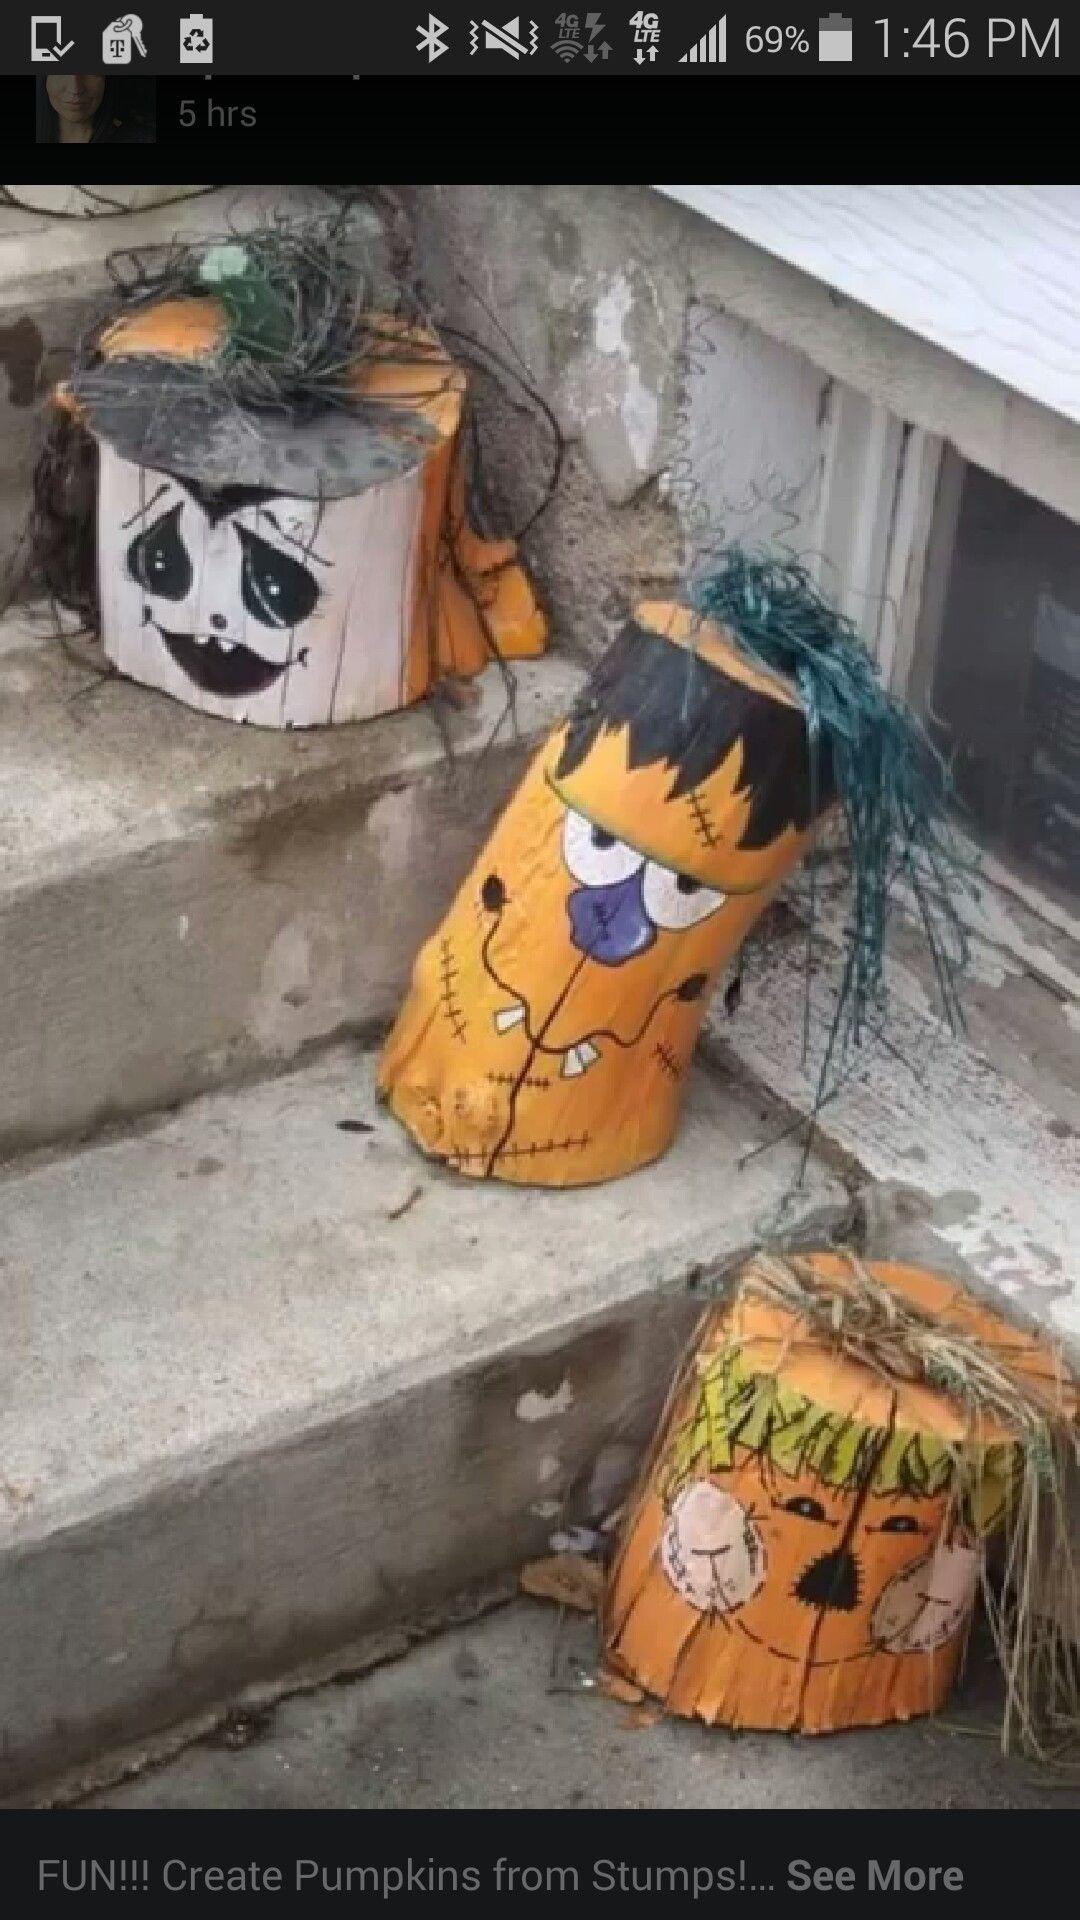 Painted Stumps Halloween Ideas Pinterest Craft, Harvest party - cool homemade halloween decorations